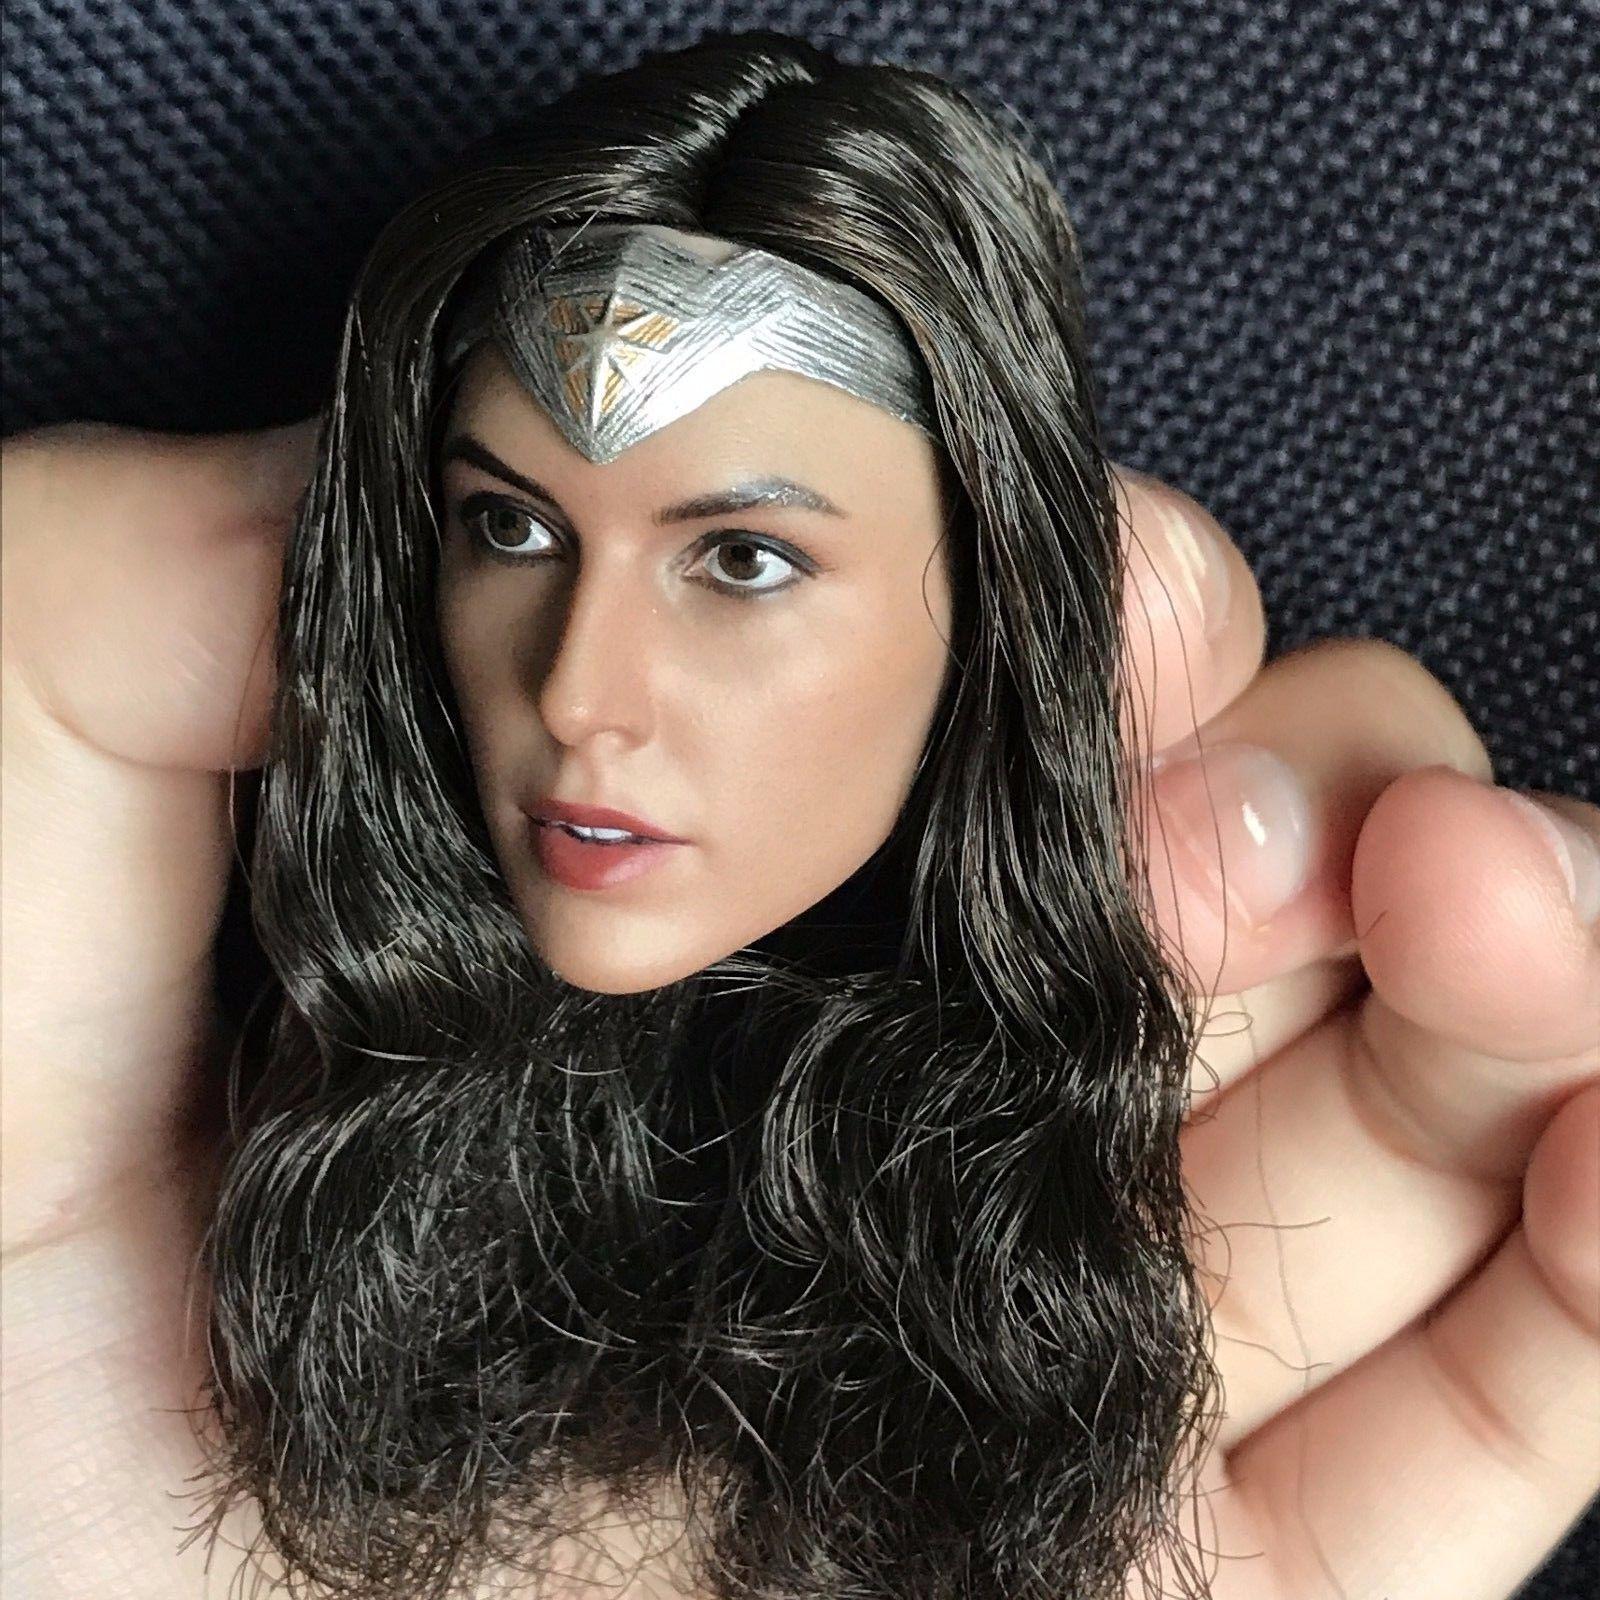 1//6 Gal Gadot WONDER WOMAN Female Head Sculpt C For Hot Toys Phicen Figure ❶USA❶